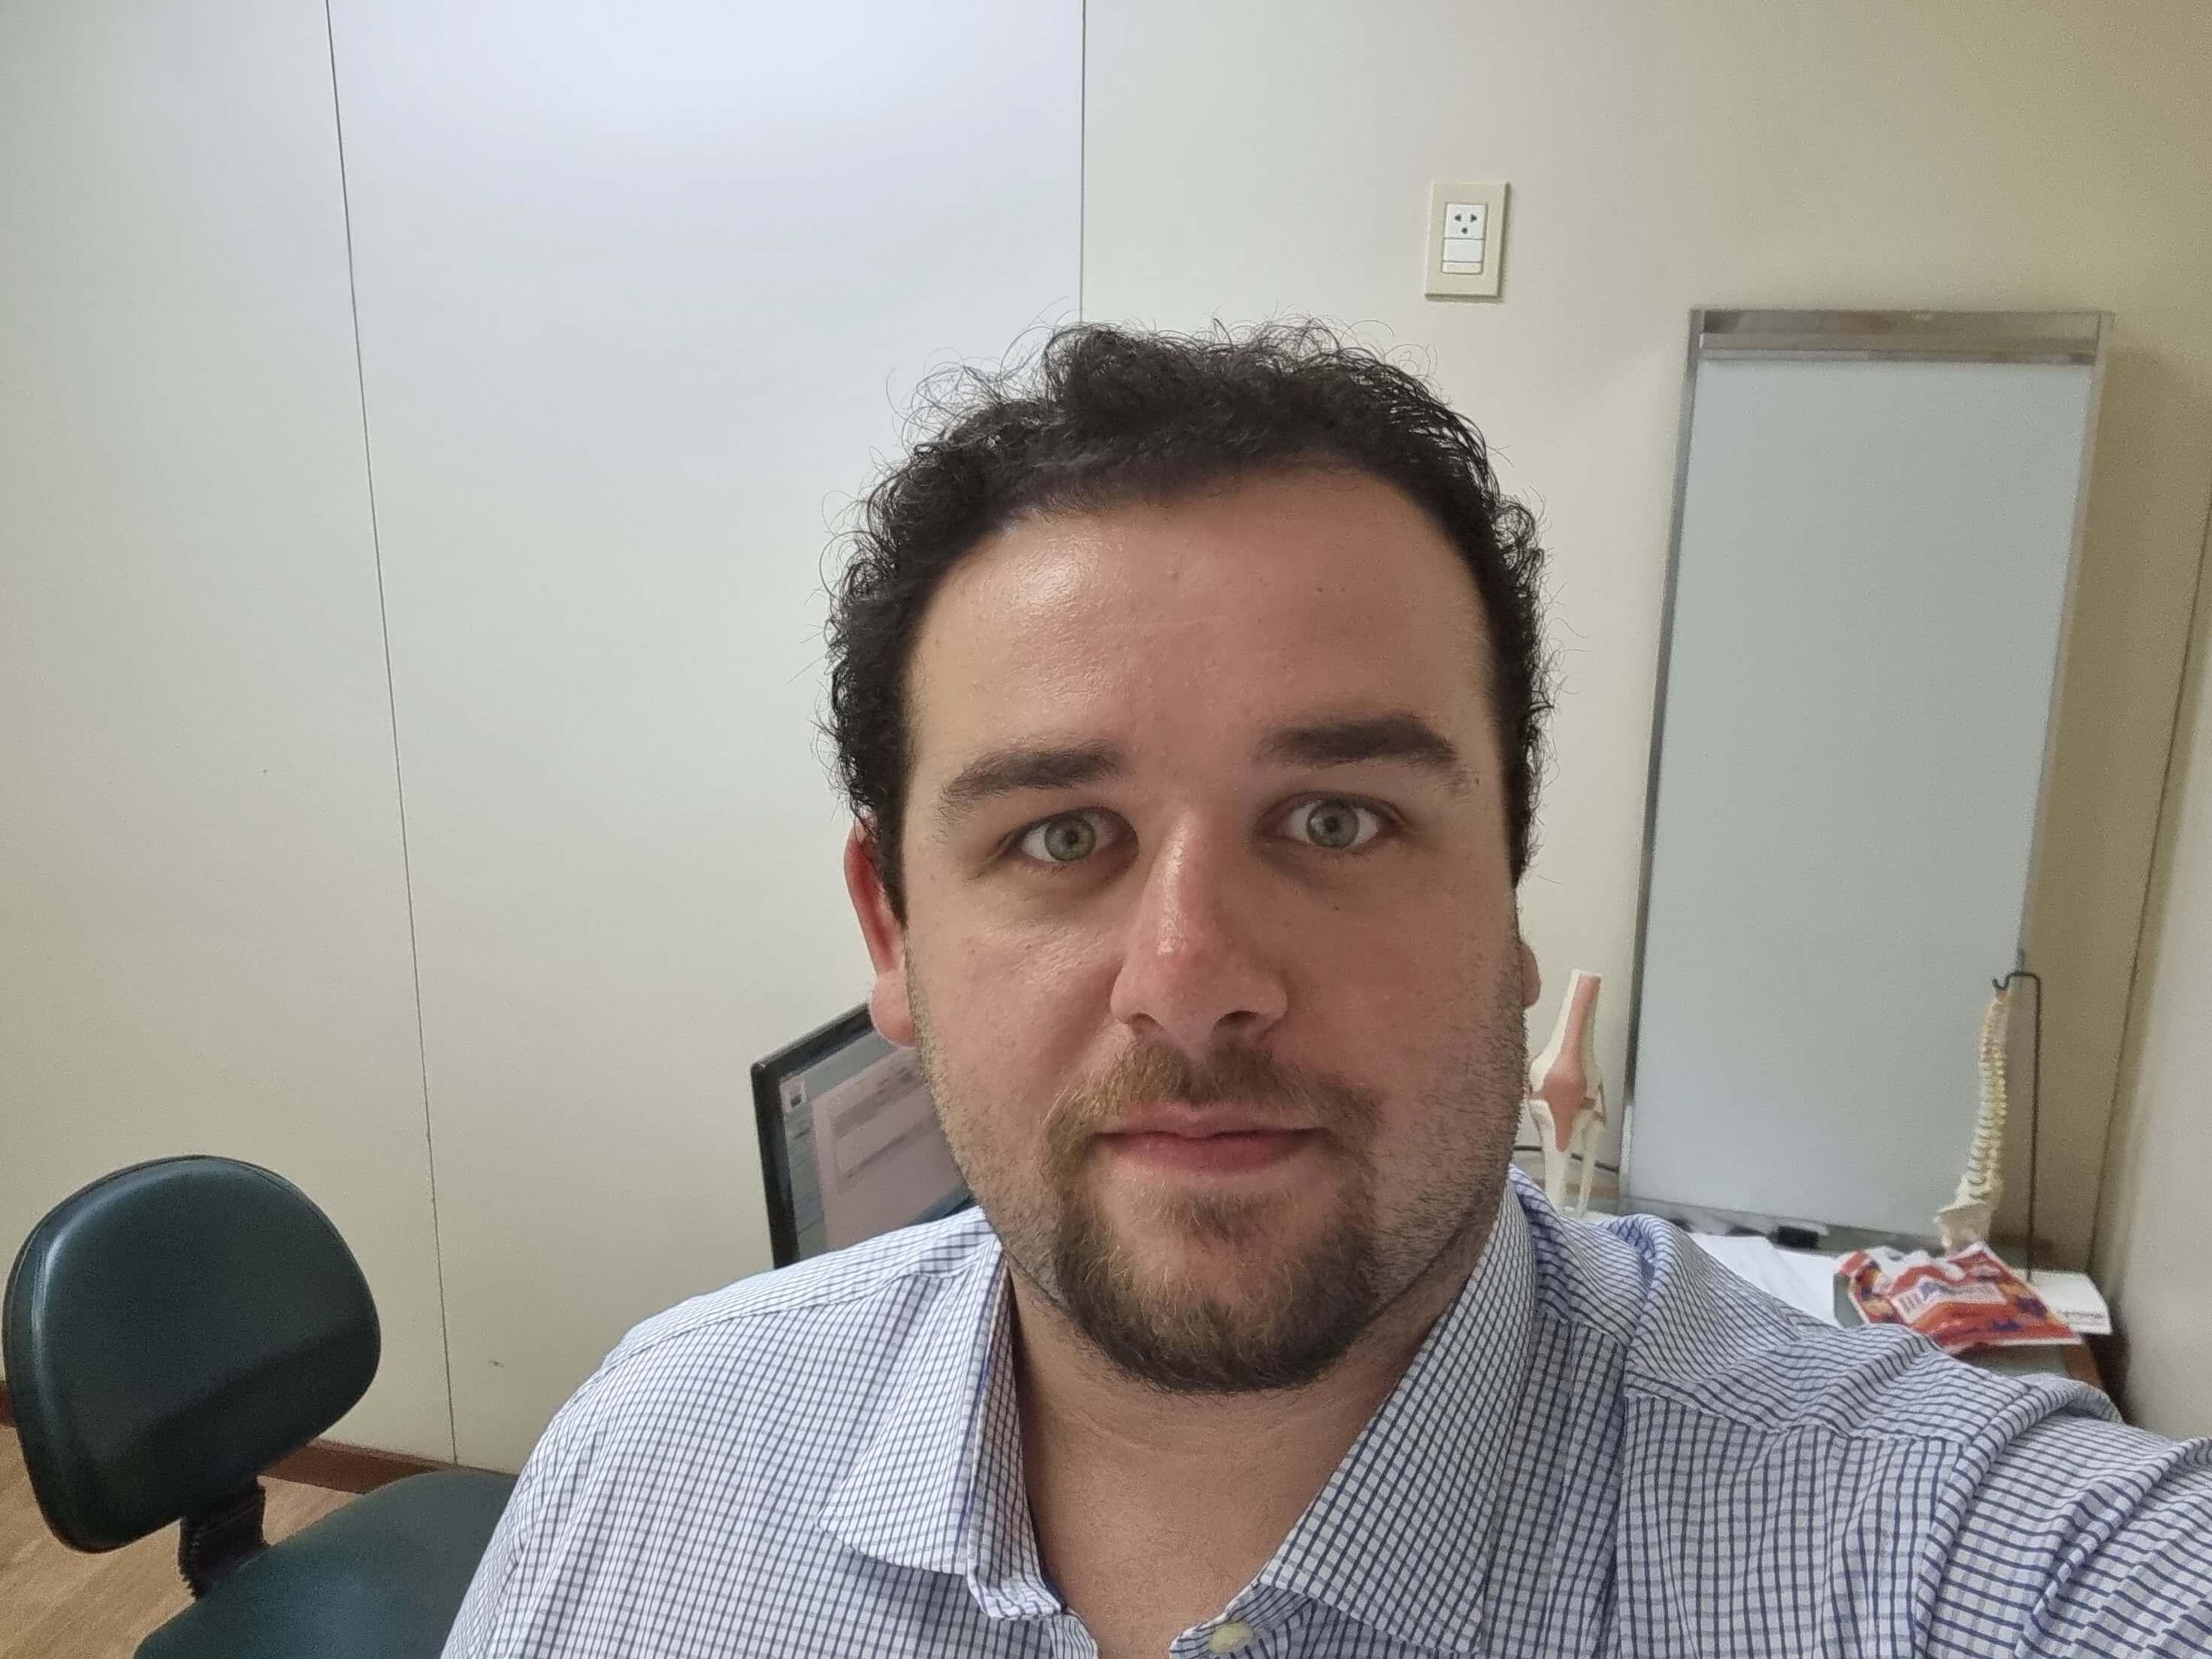 Jacques Charlab - Ortopedista - Rio de Janeiro/RJ